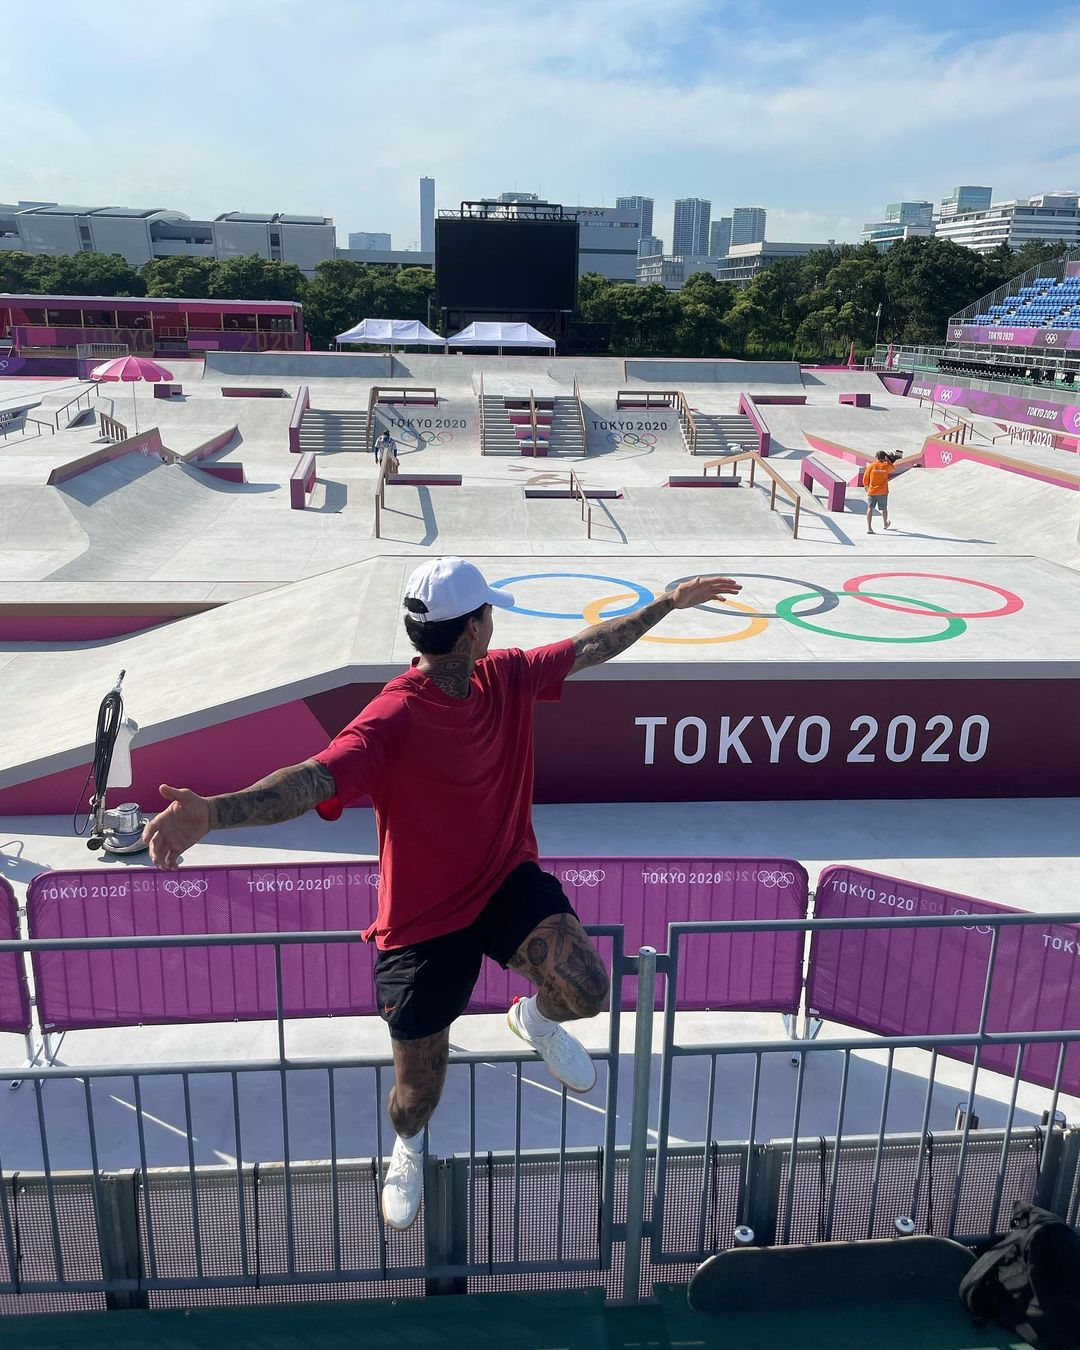 nyjah houston skate jeux olympique de tokyo 2020